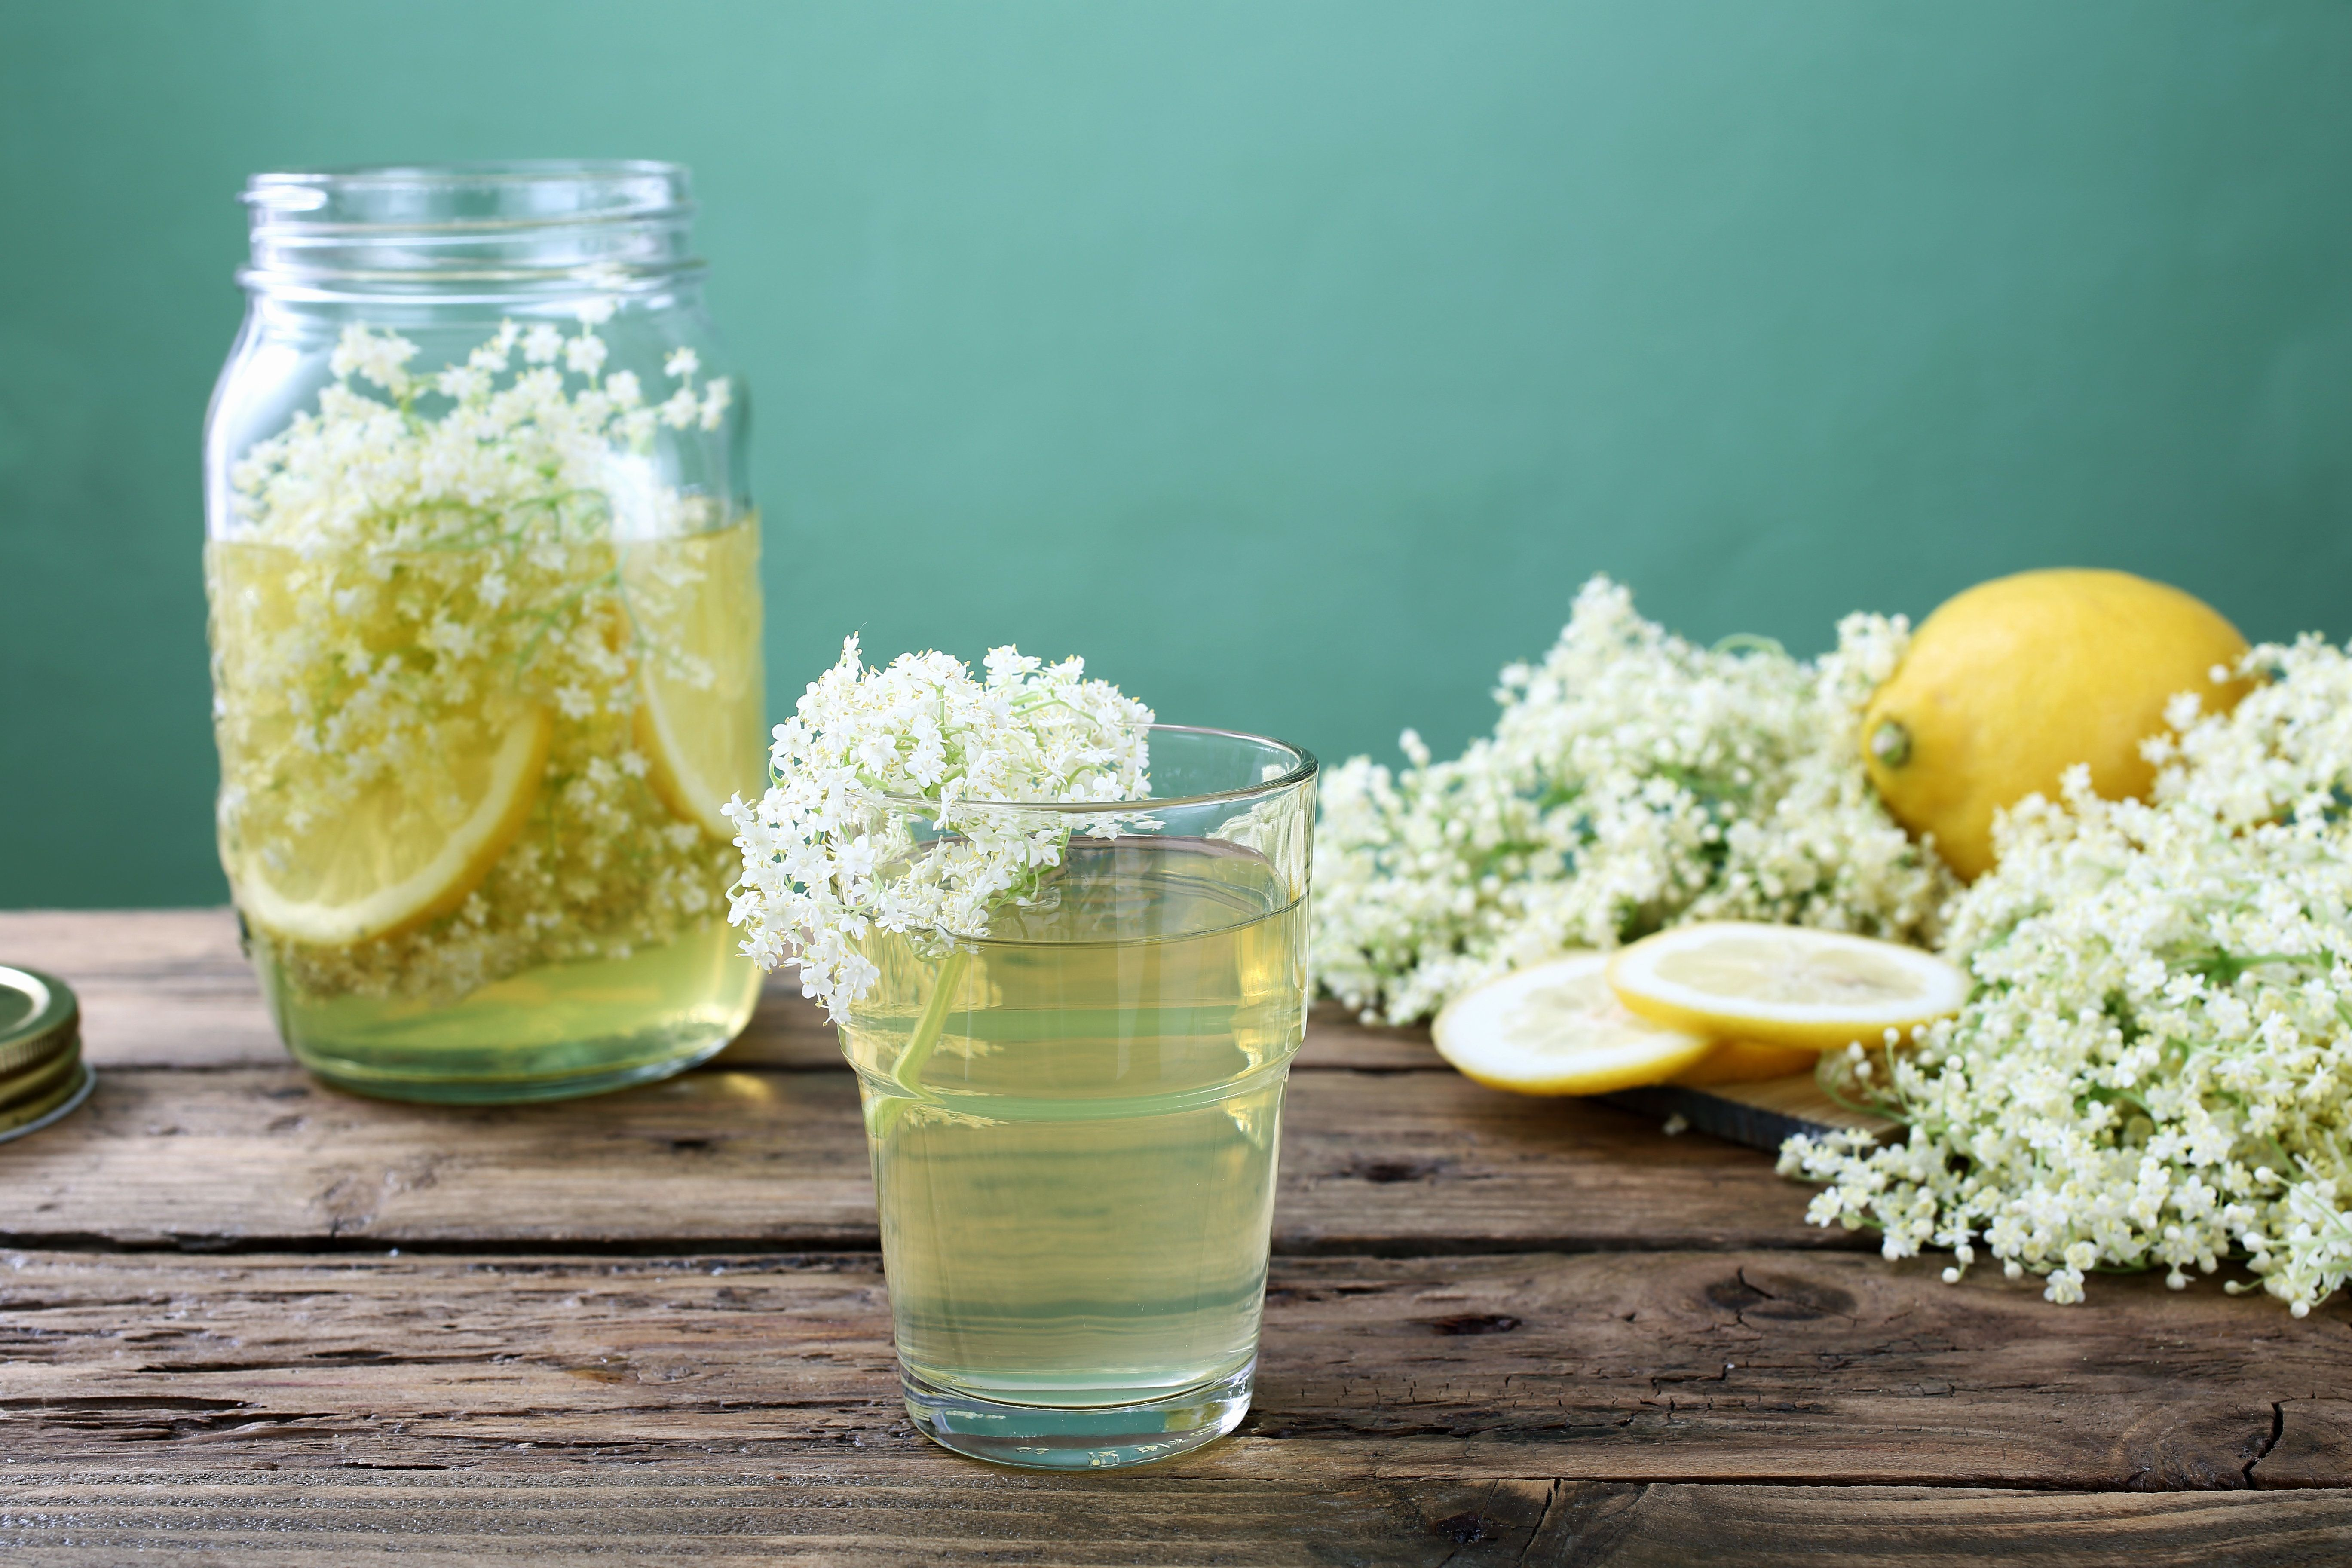 elderflower and lemon drink in glass green background